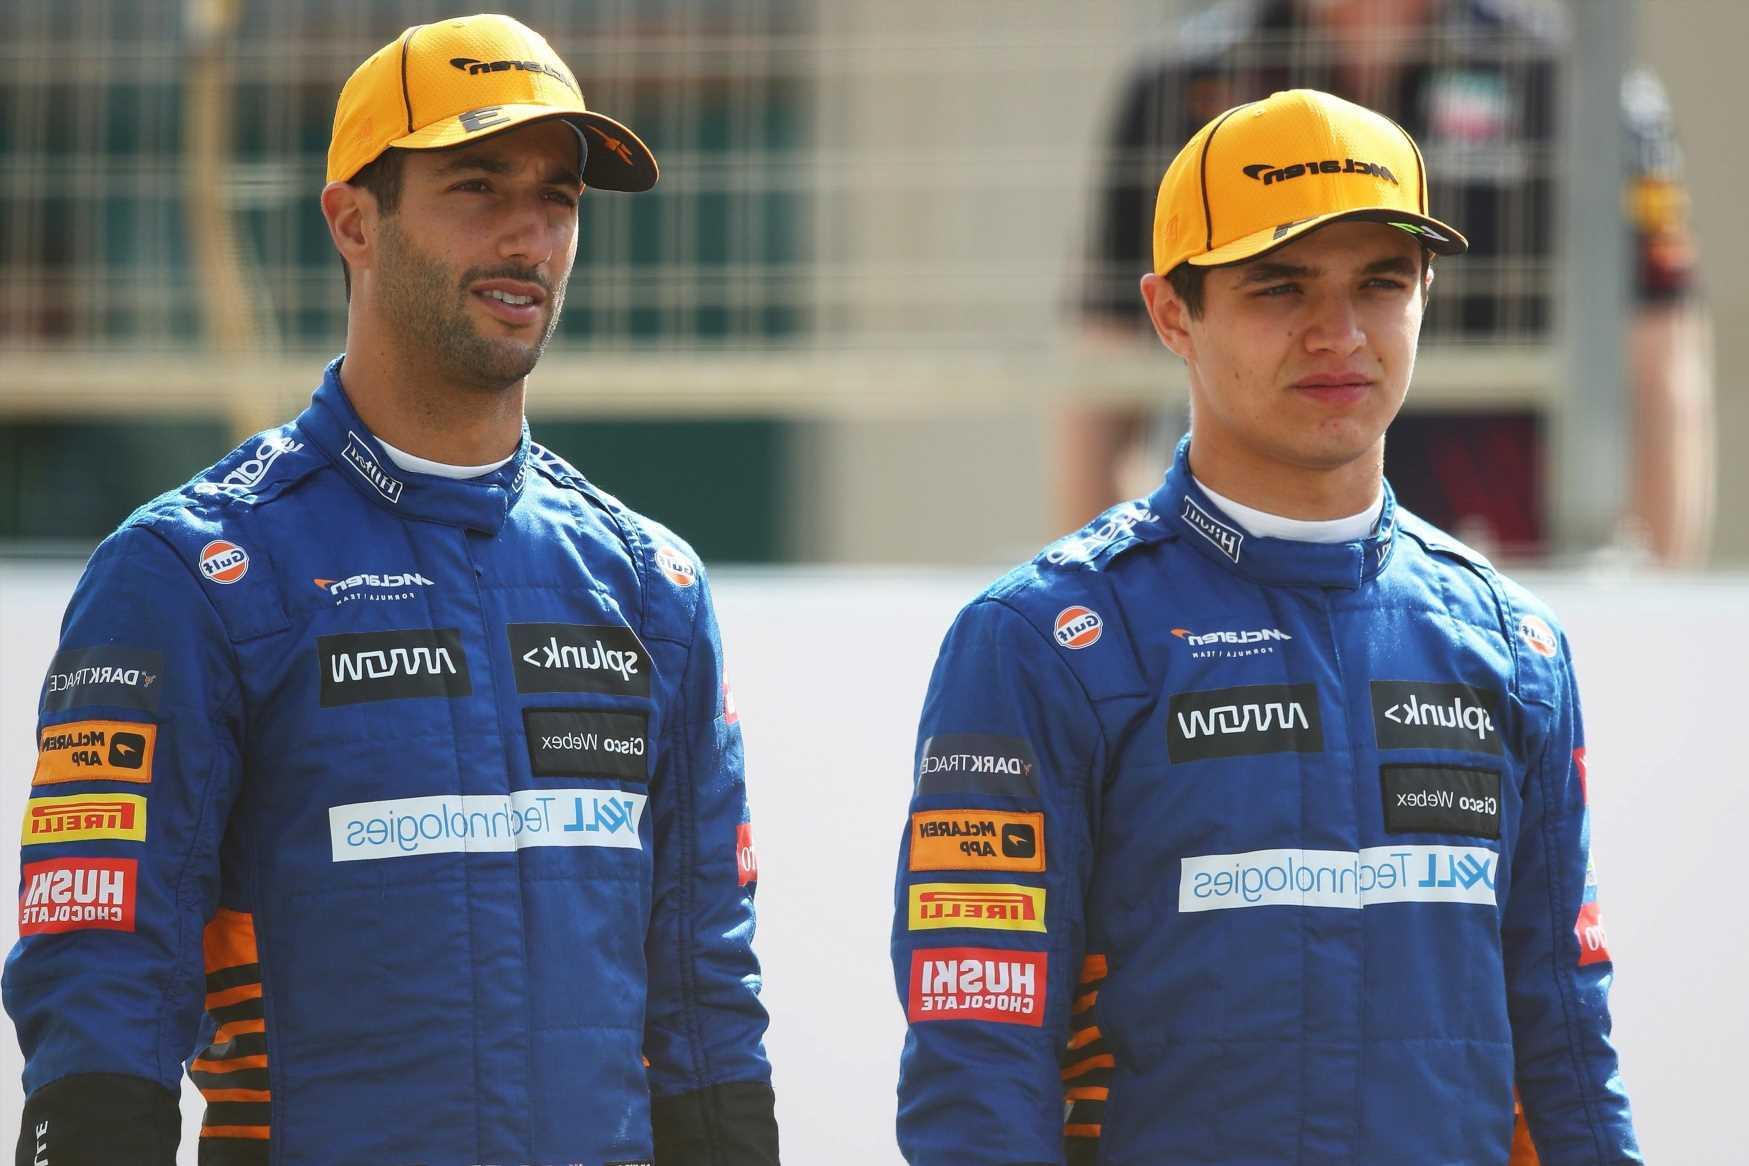 Lando Norris slams F1 fans for creating 'absolute c**p' after he waved to Daniel Ricciardo at Monaco Grand Prix